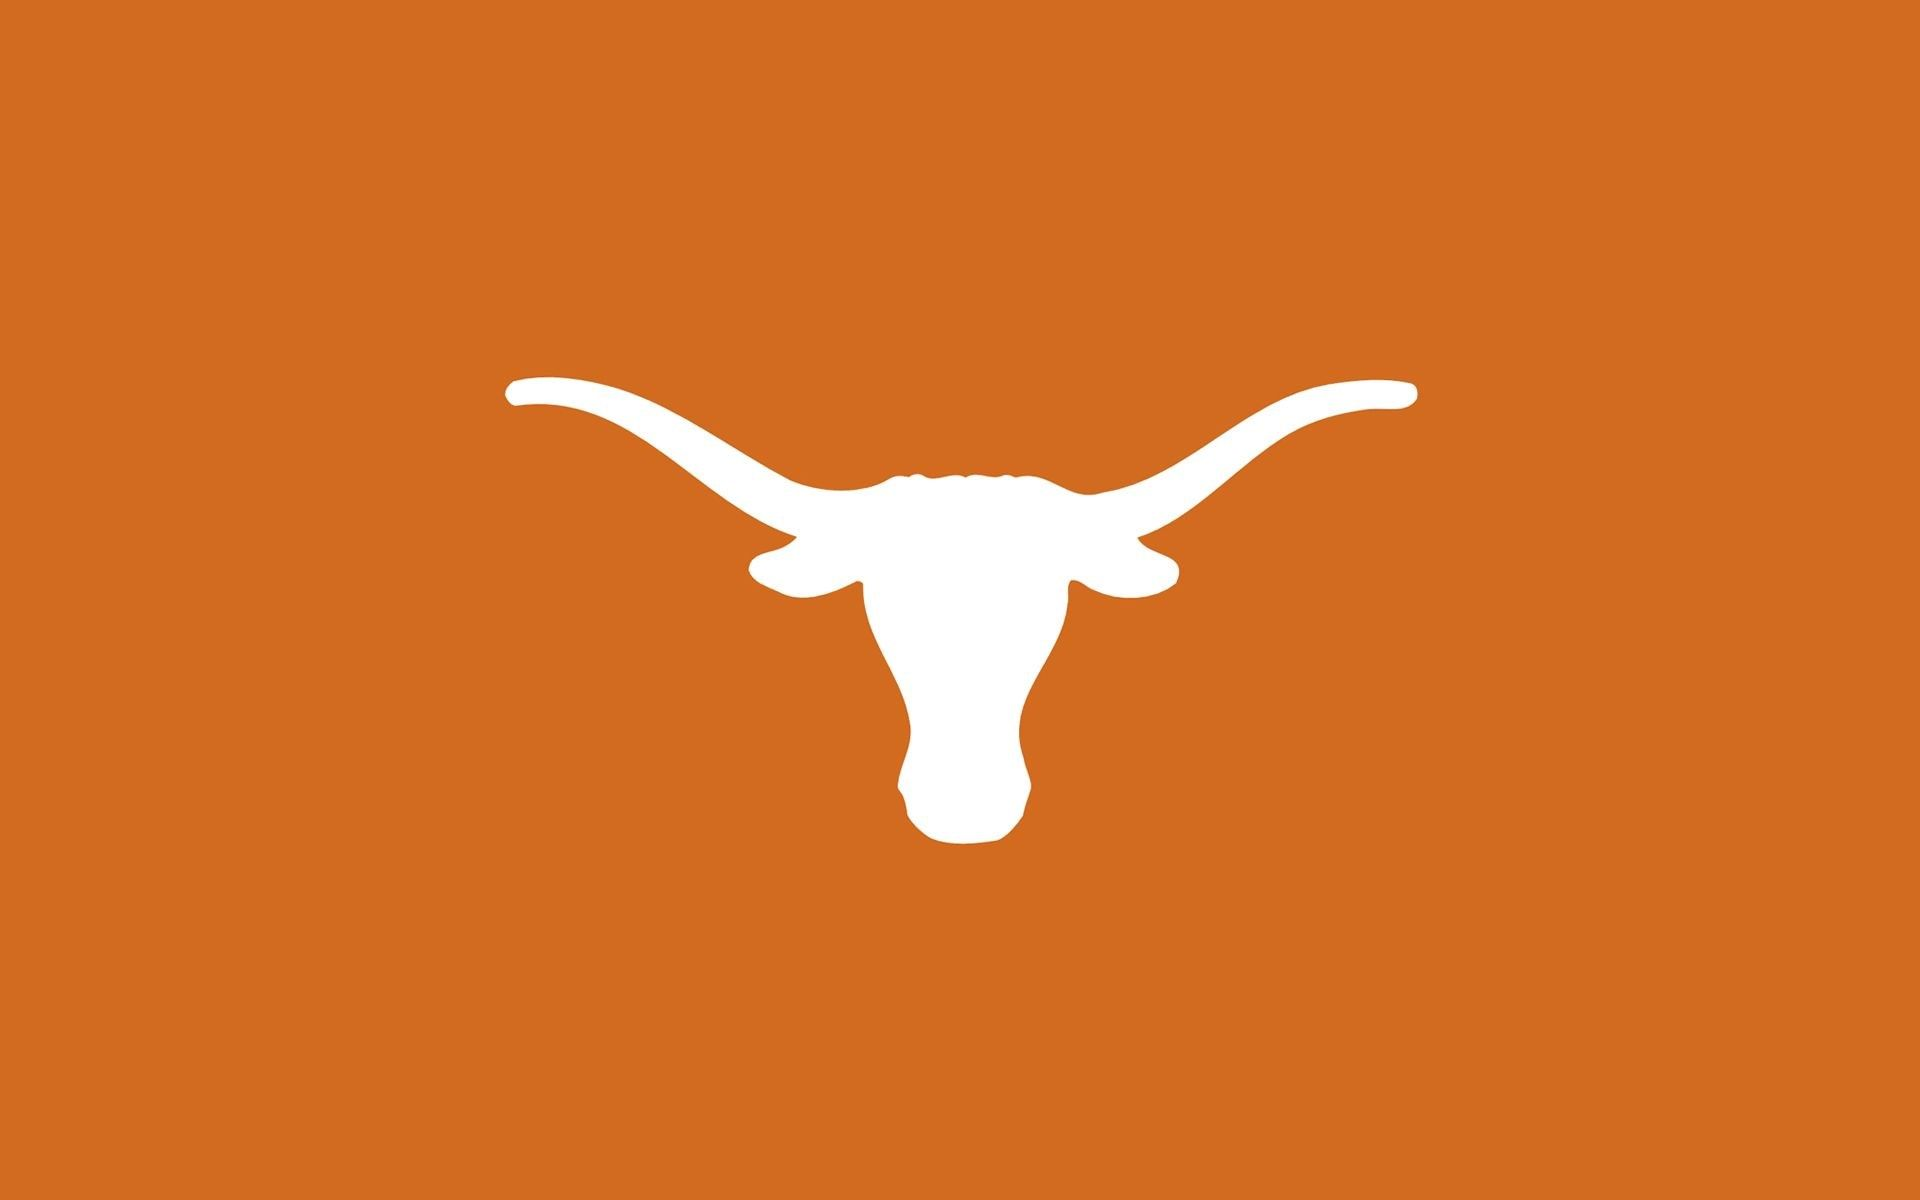 Texas Longhorns Football Wallpapers Longhorns Football Texas Longhorns Football Texas Football